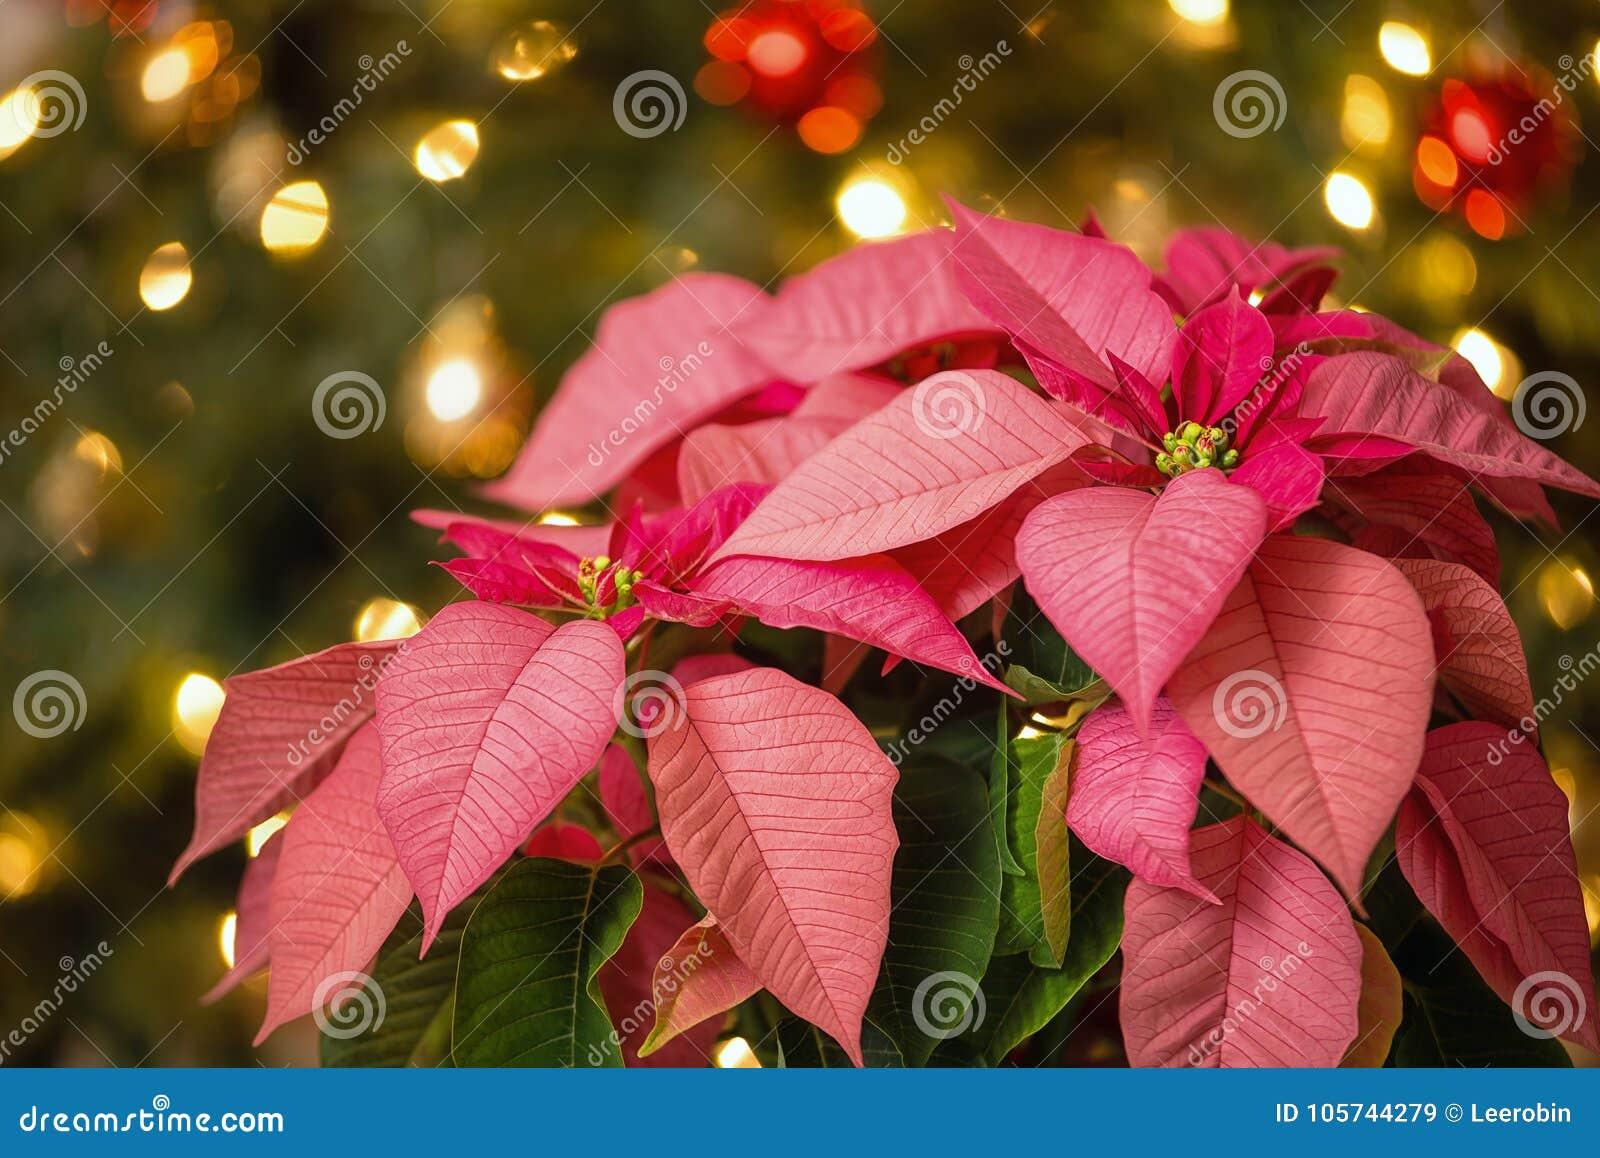 Pink Poinsettia flower, Christmas Star